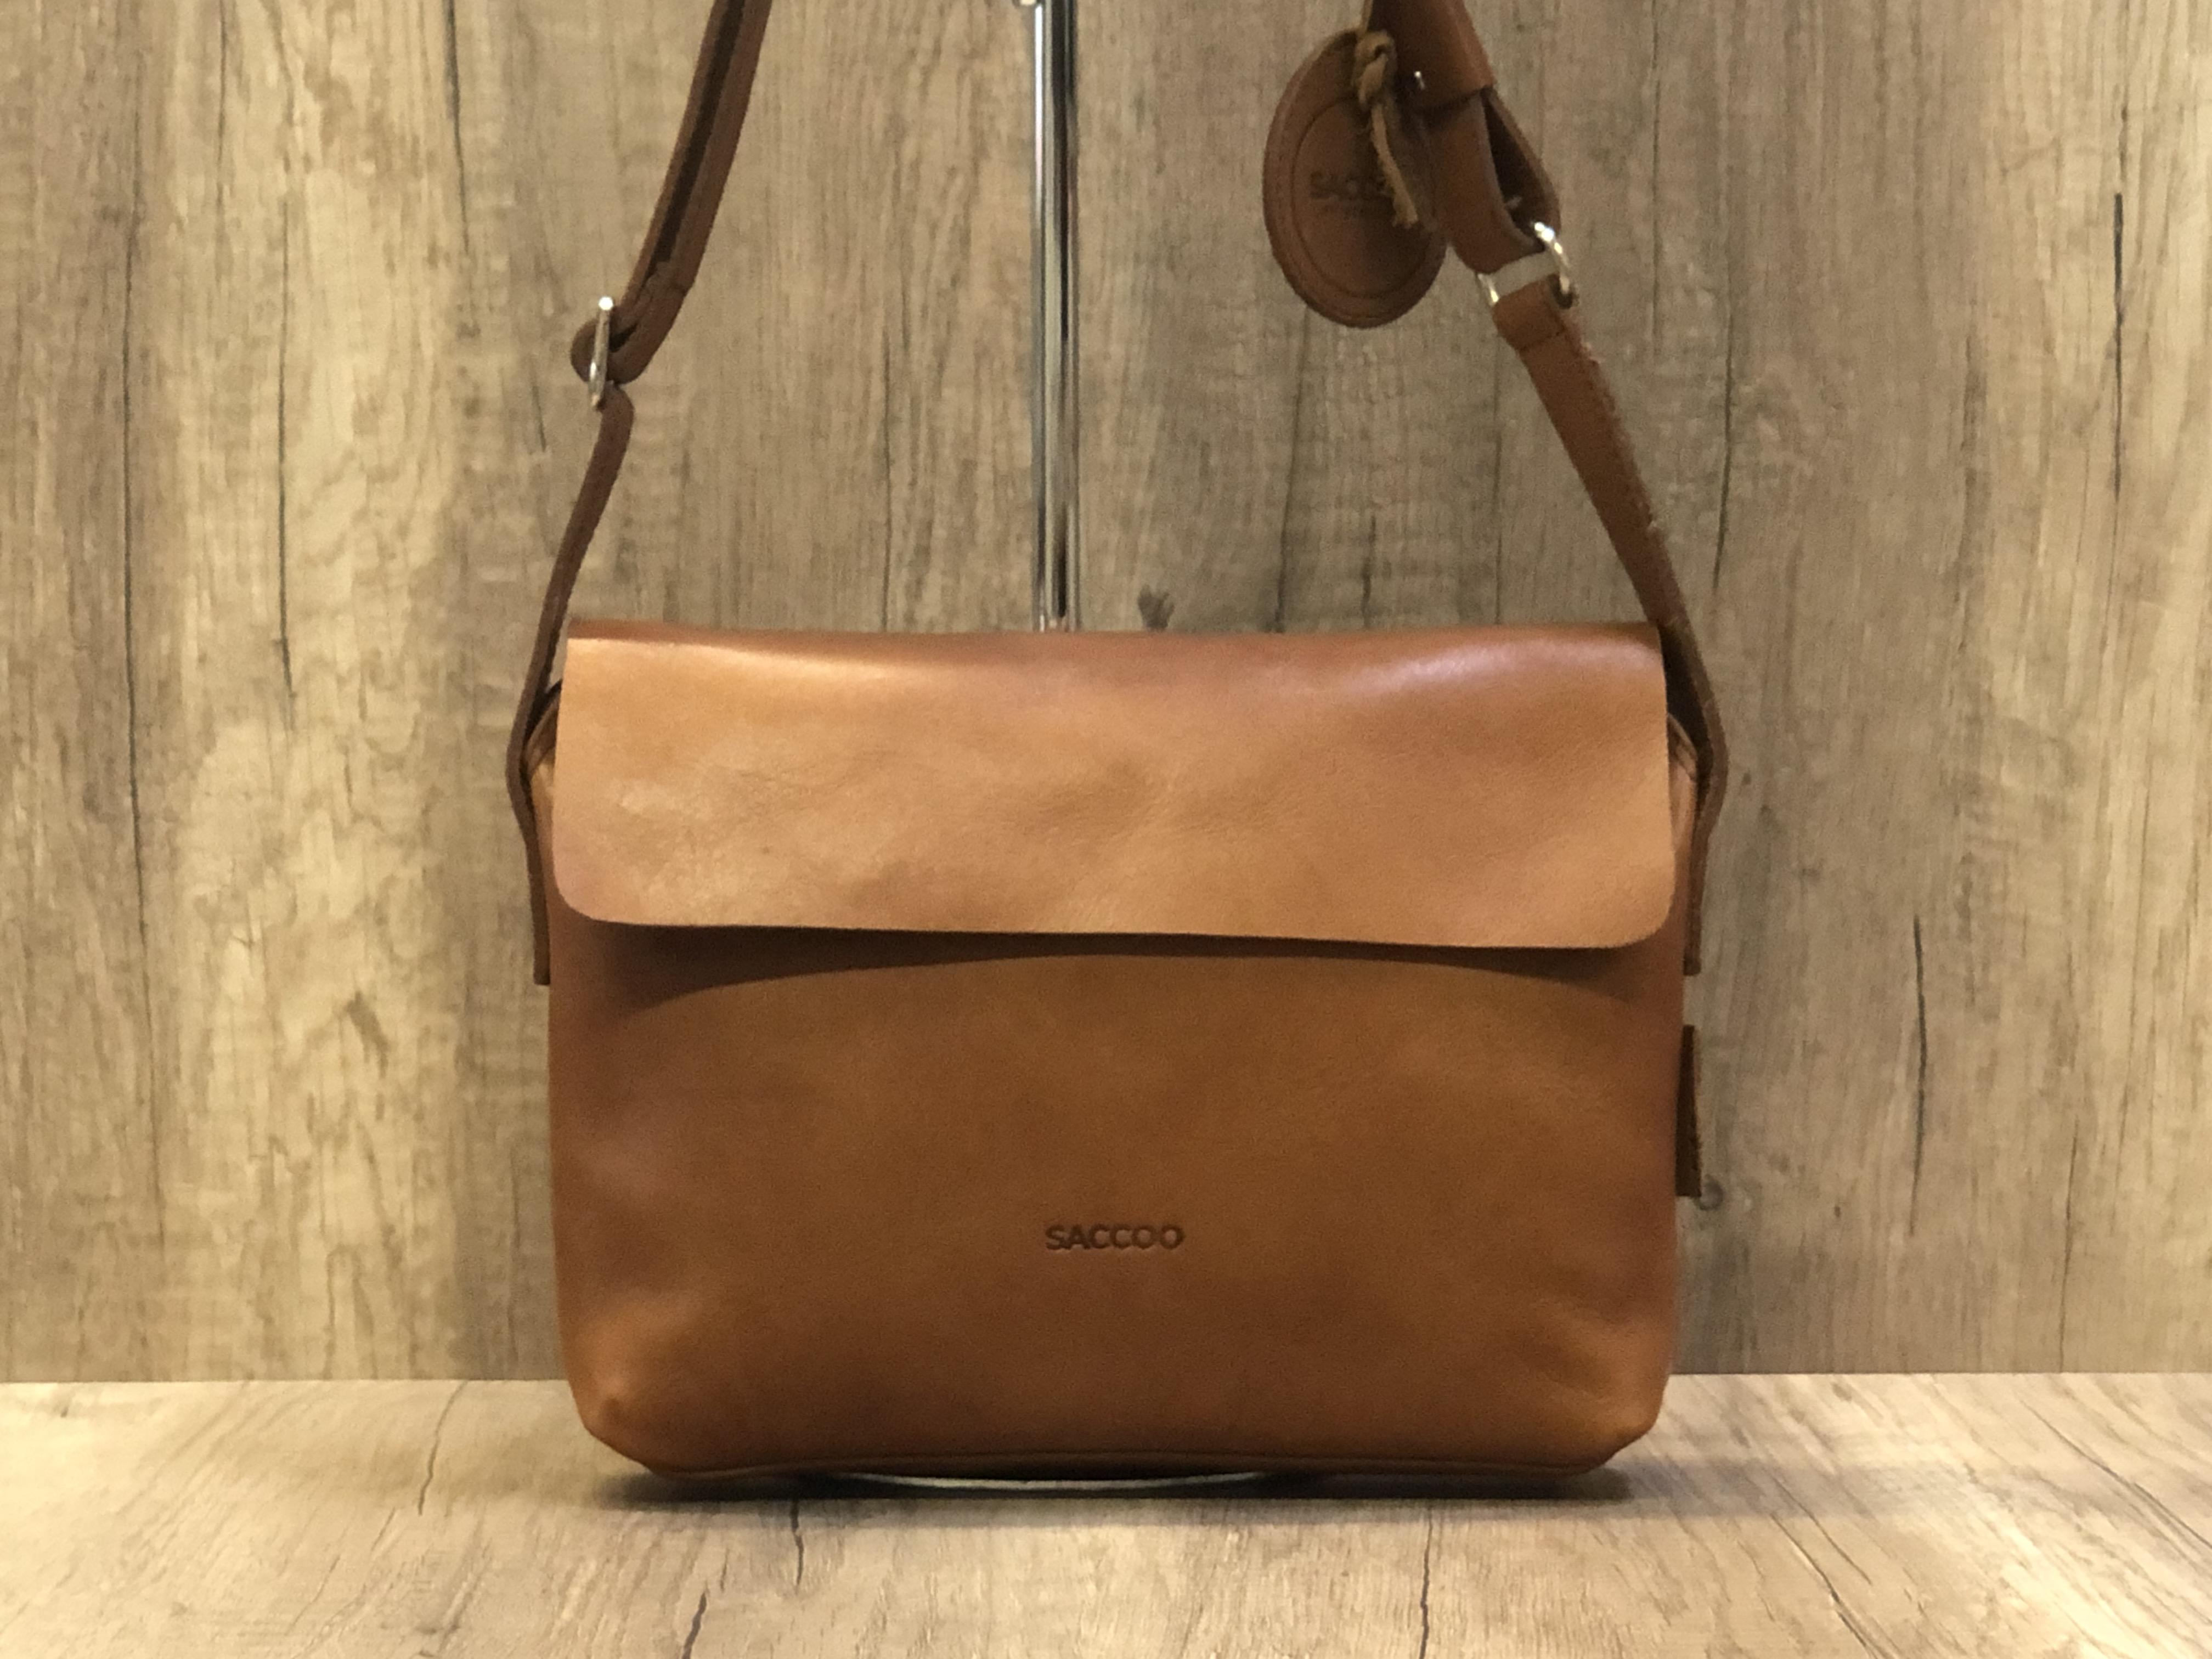 Saccoo-handtassen 3